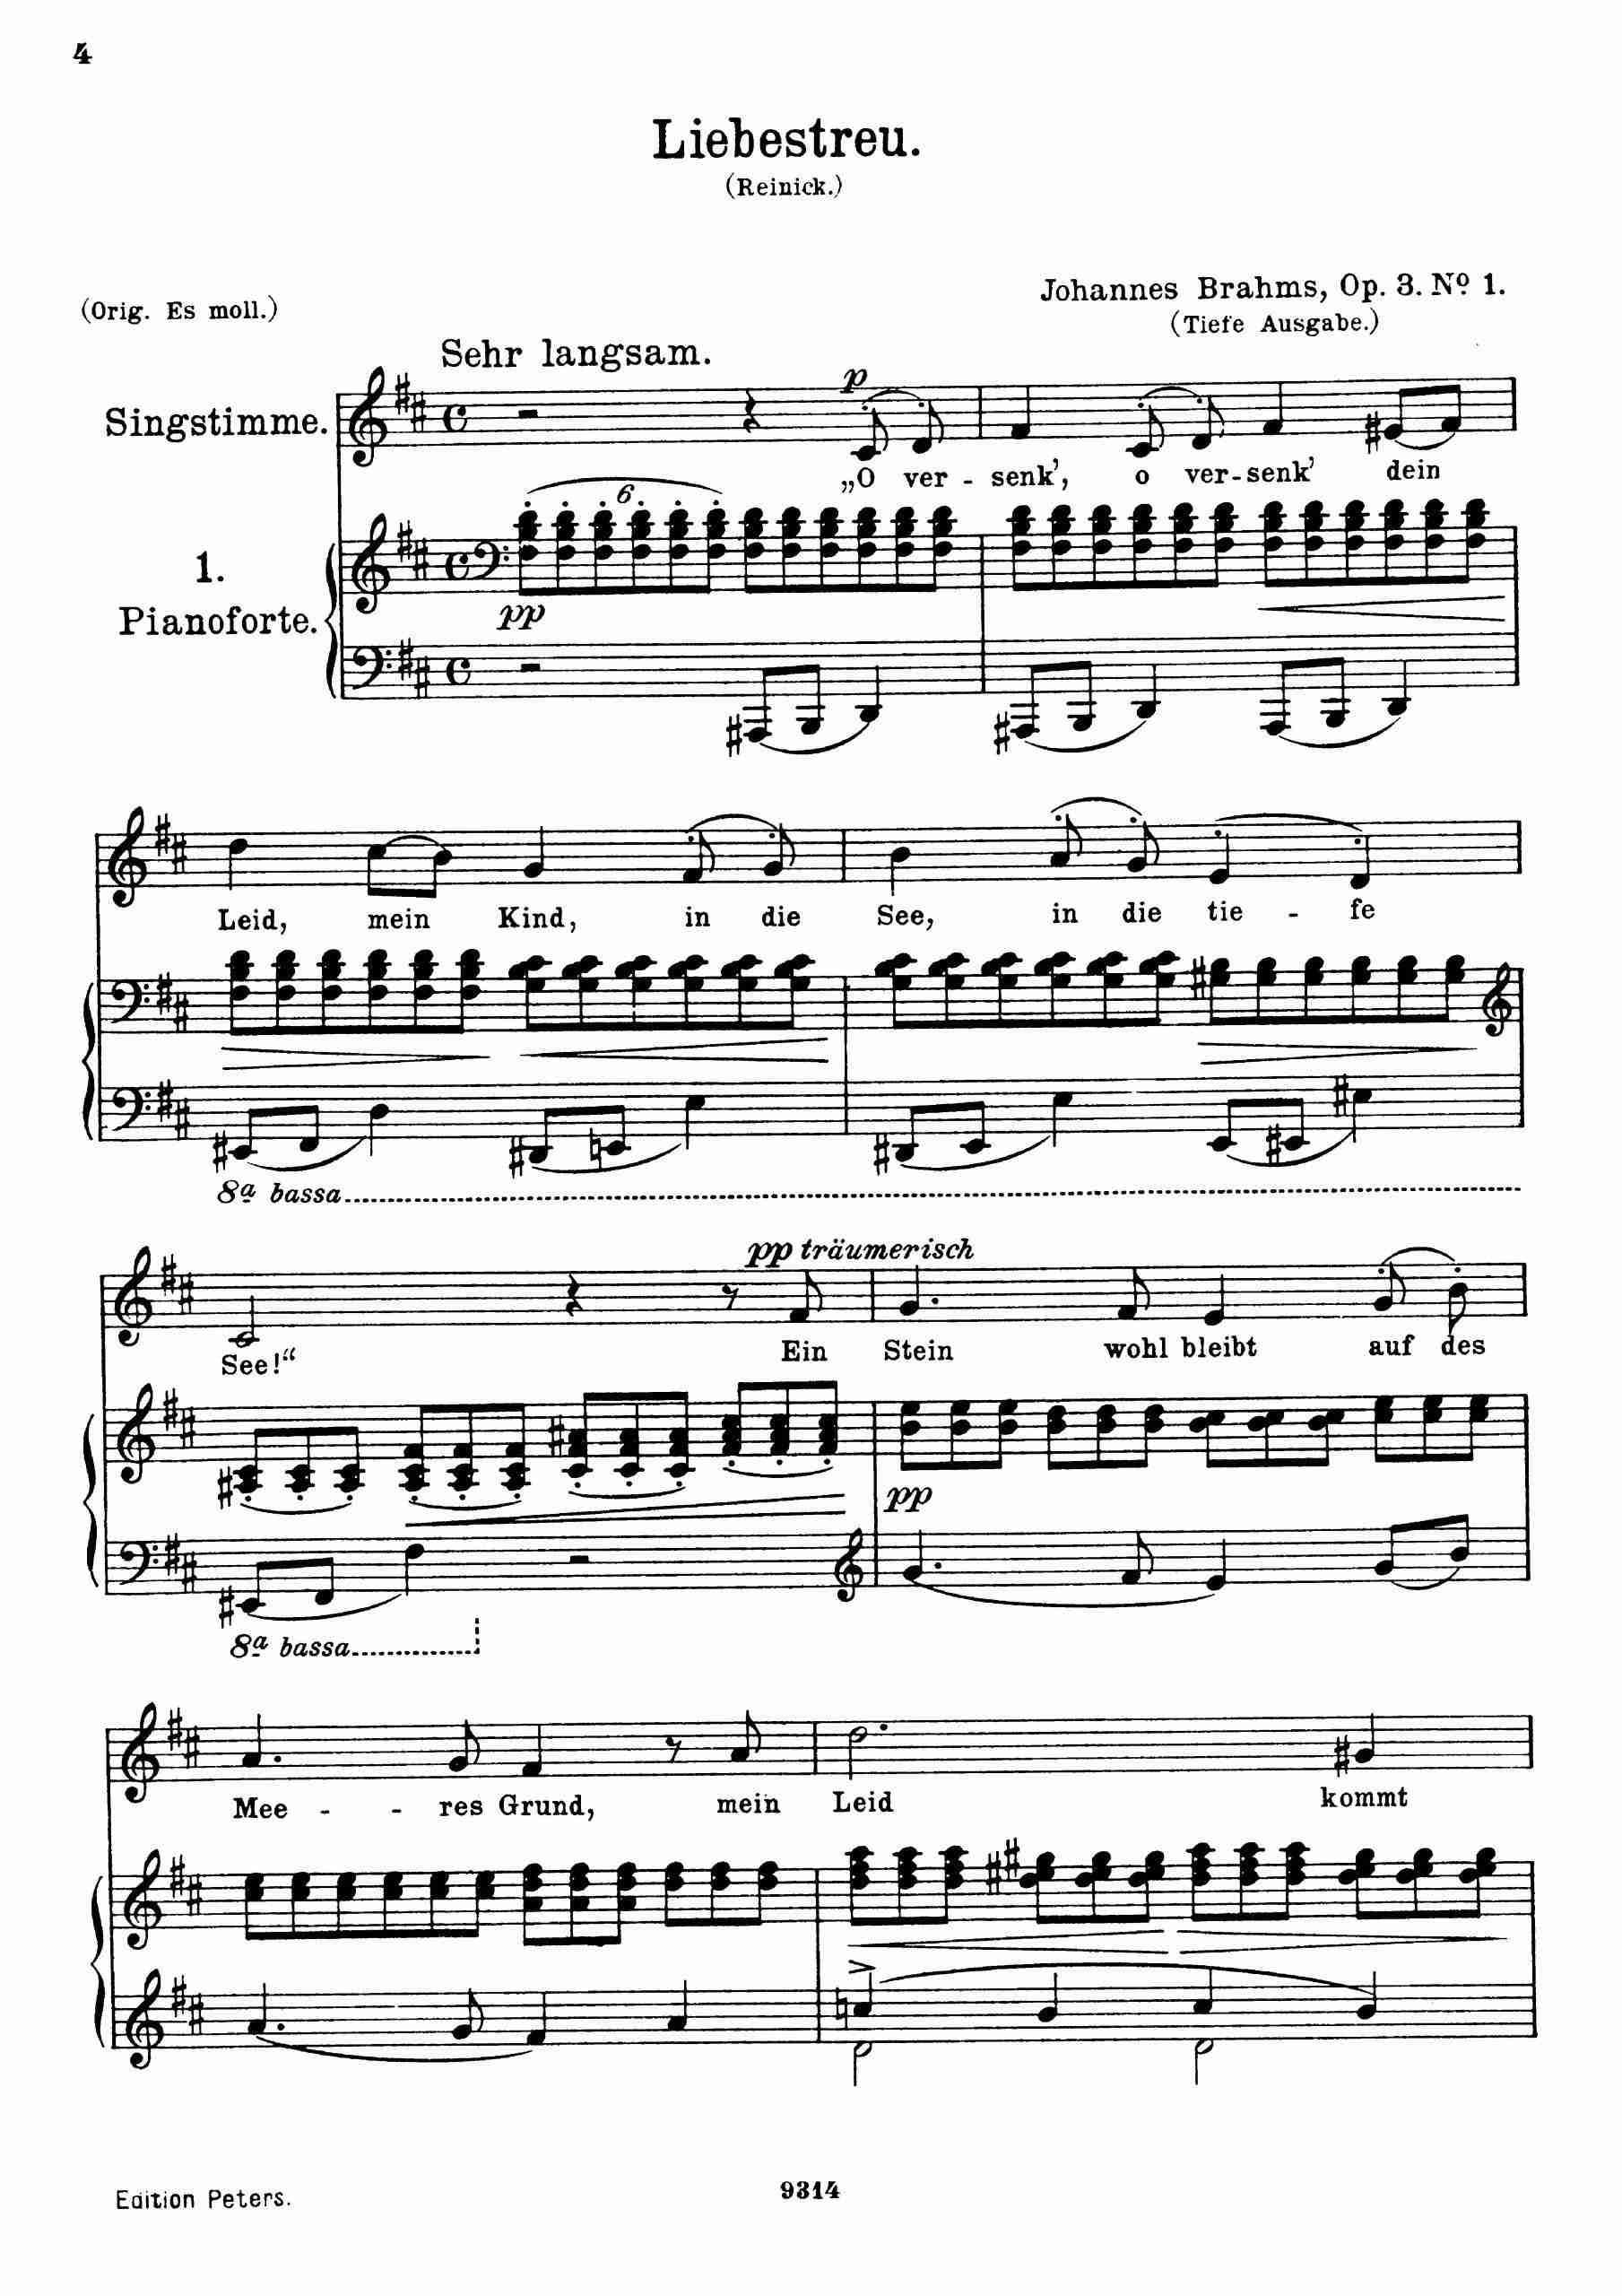 Brahms, Johannes - 6 Songs, Op.3 (low voice, no.1)